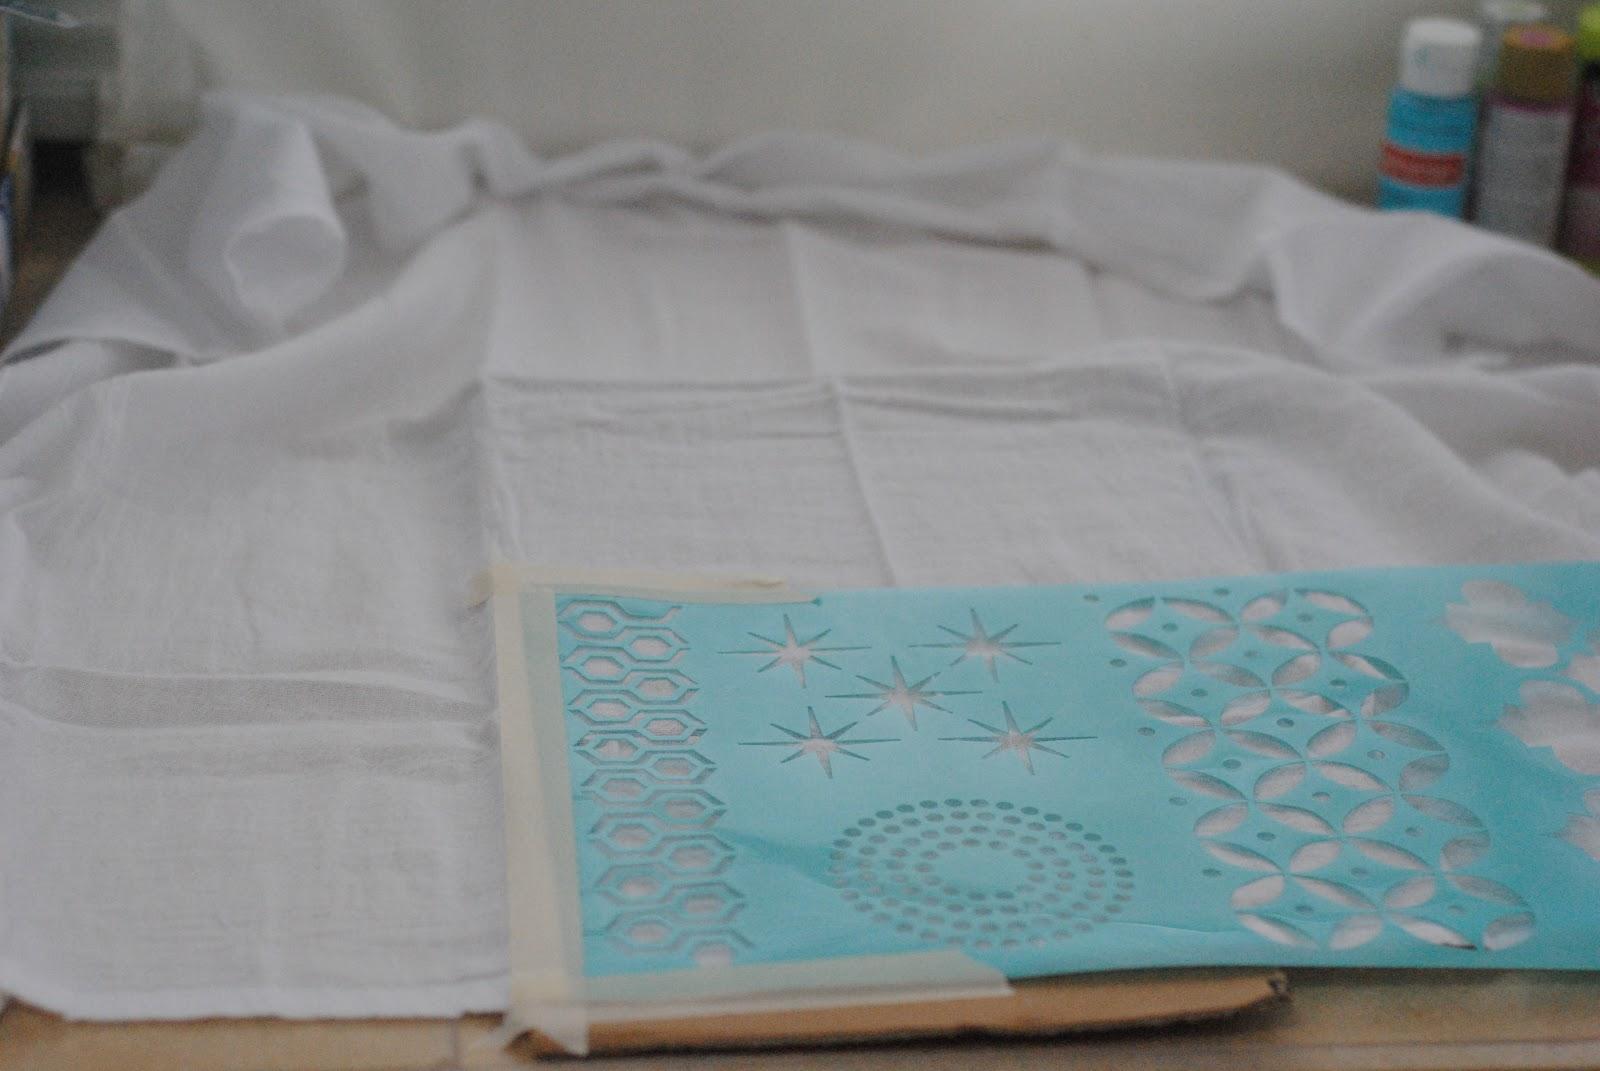 Towel For Kitchen Remodel Tucson Diy Tea Tutorial Stamped Towels Stenciled